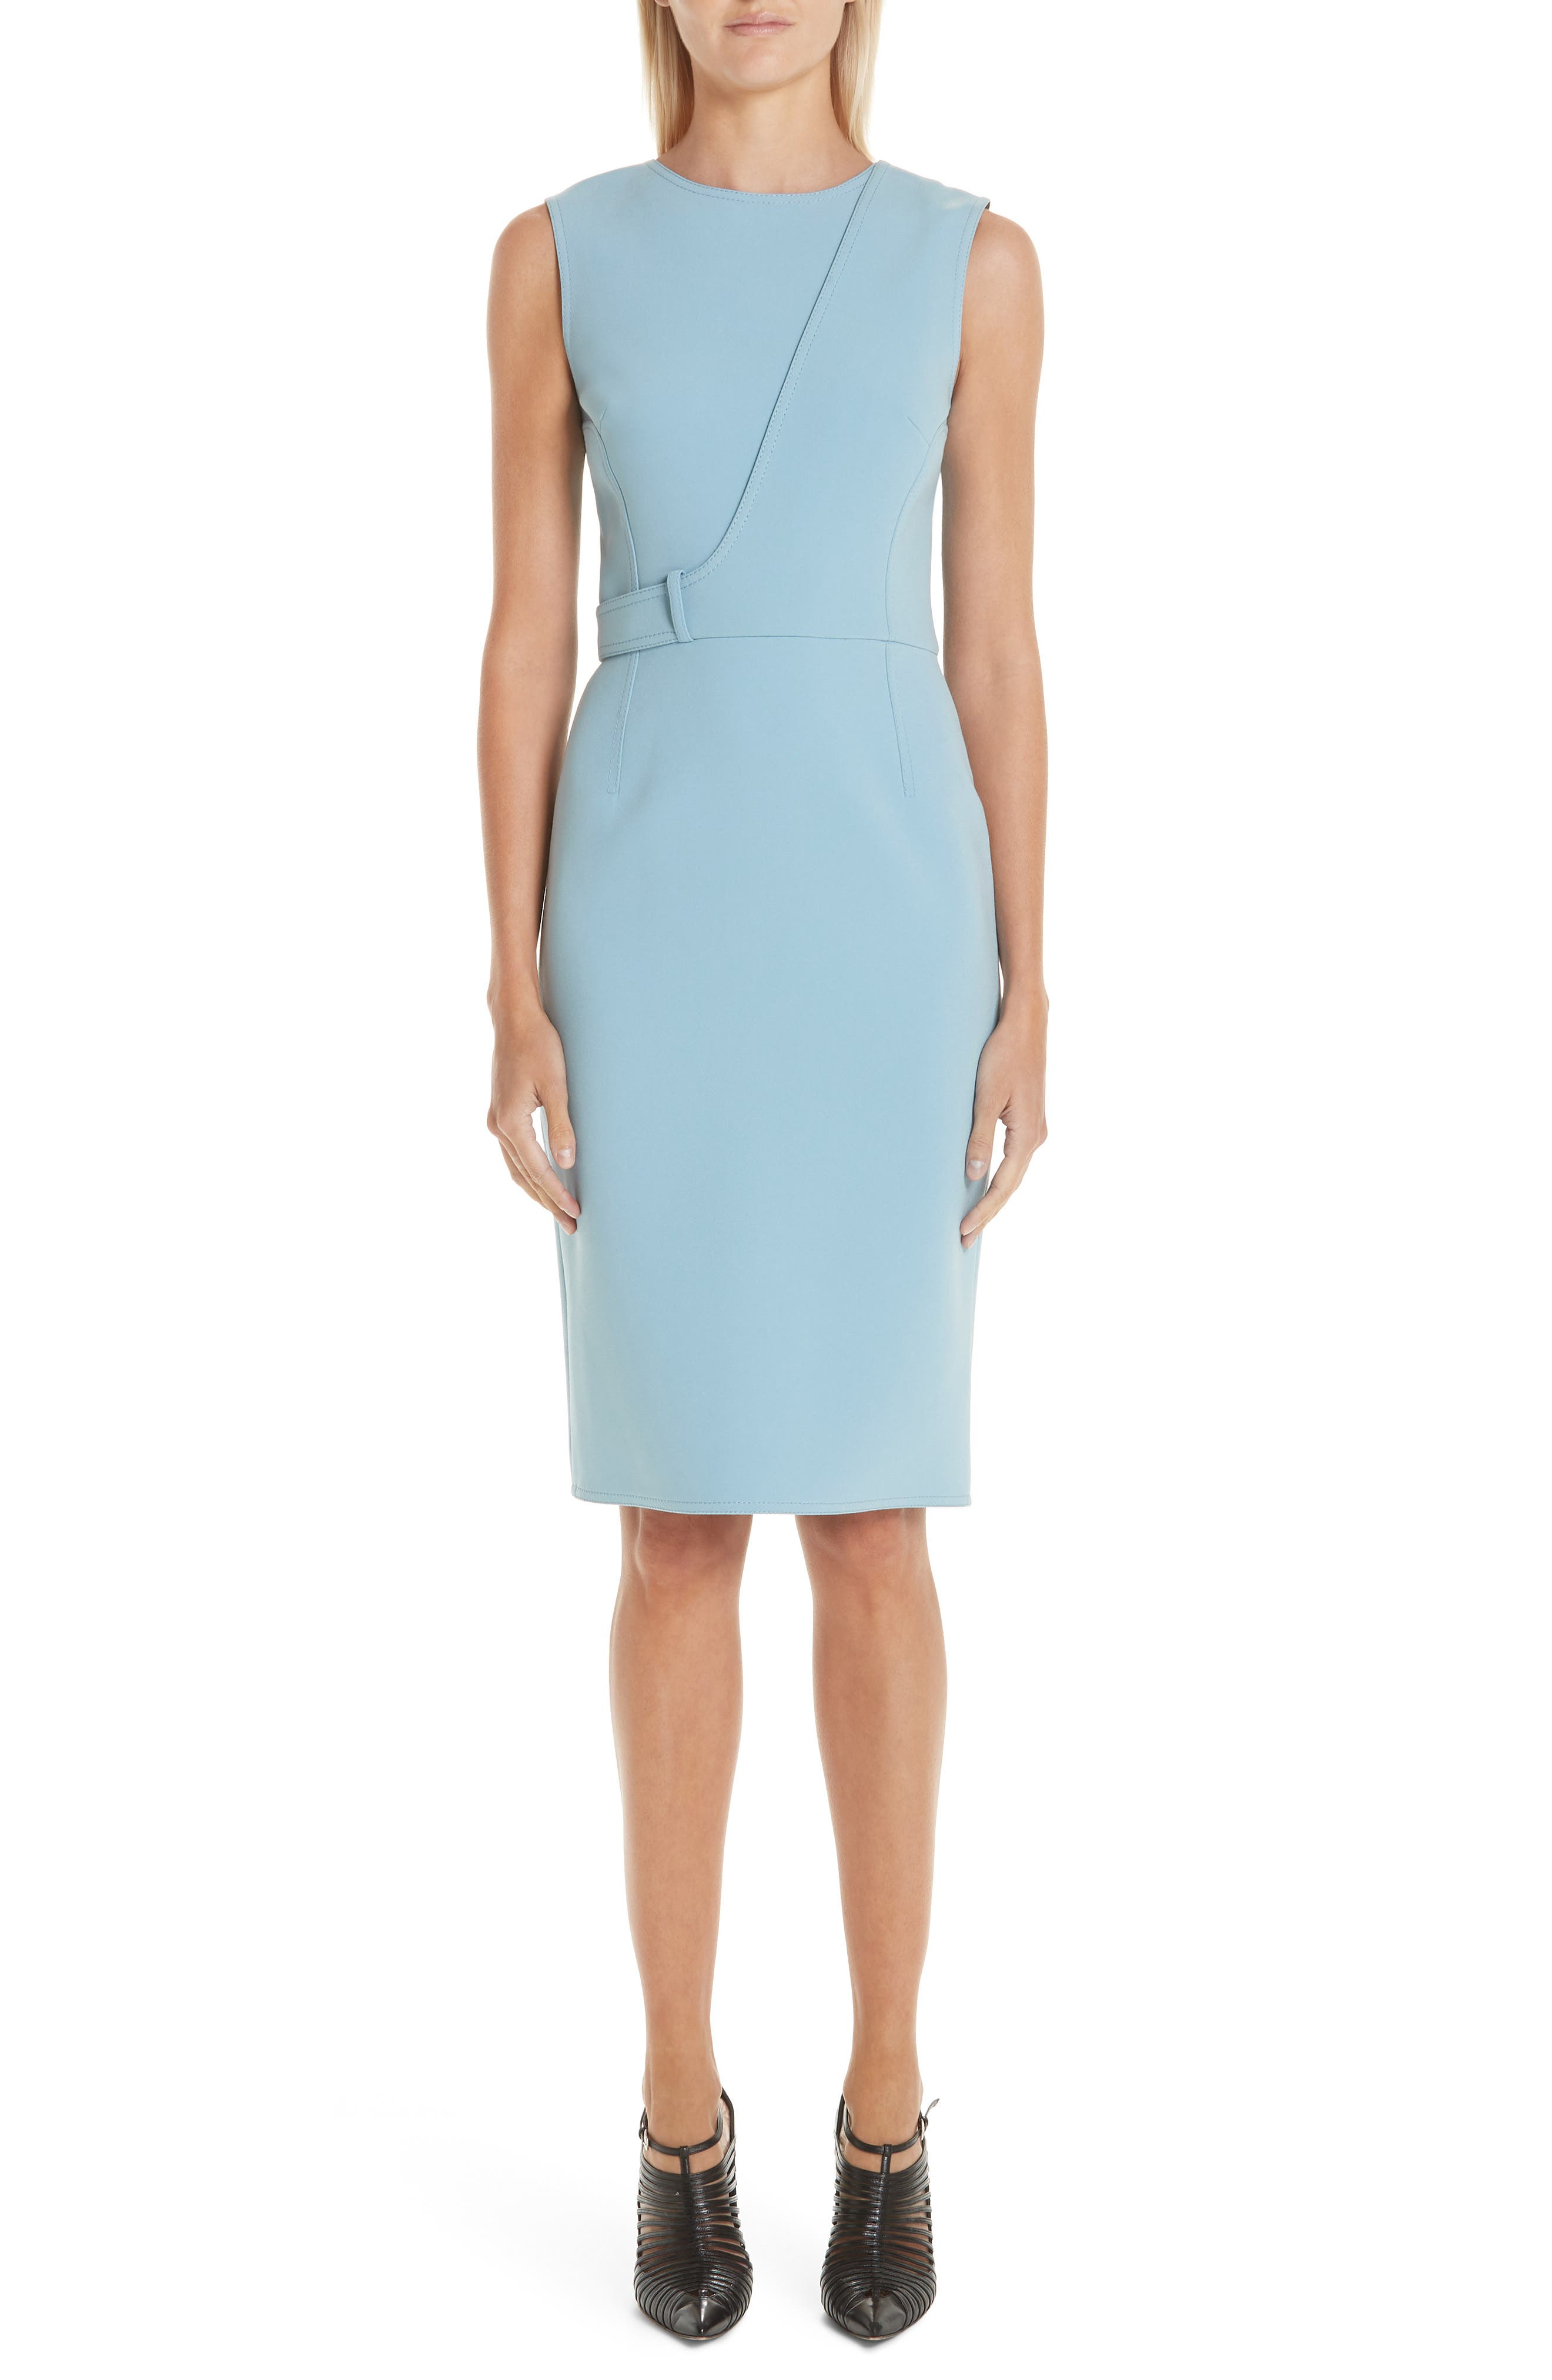 Jason Wu Collection Double Face Compact Crepe Dress, Blue